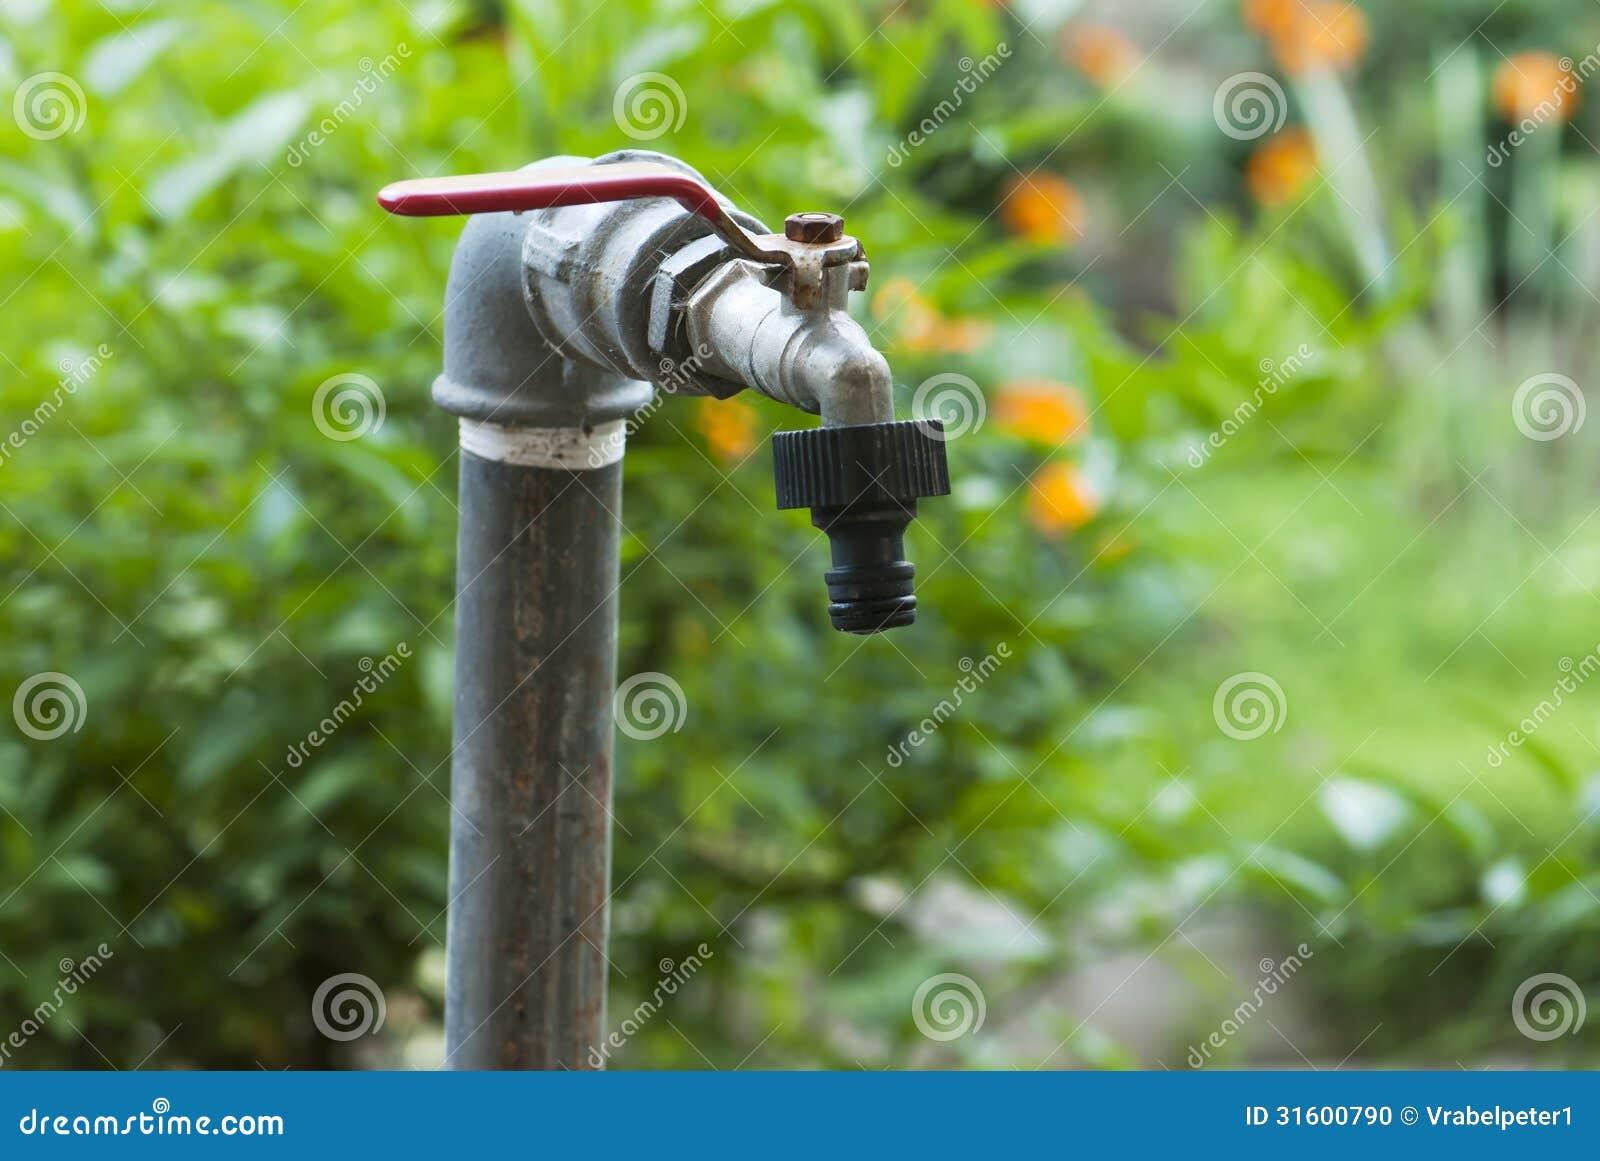 Superieur Detail Of Old Garden Faucet.